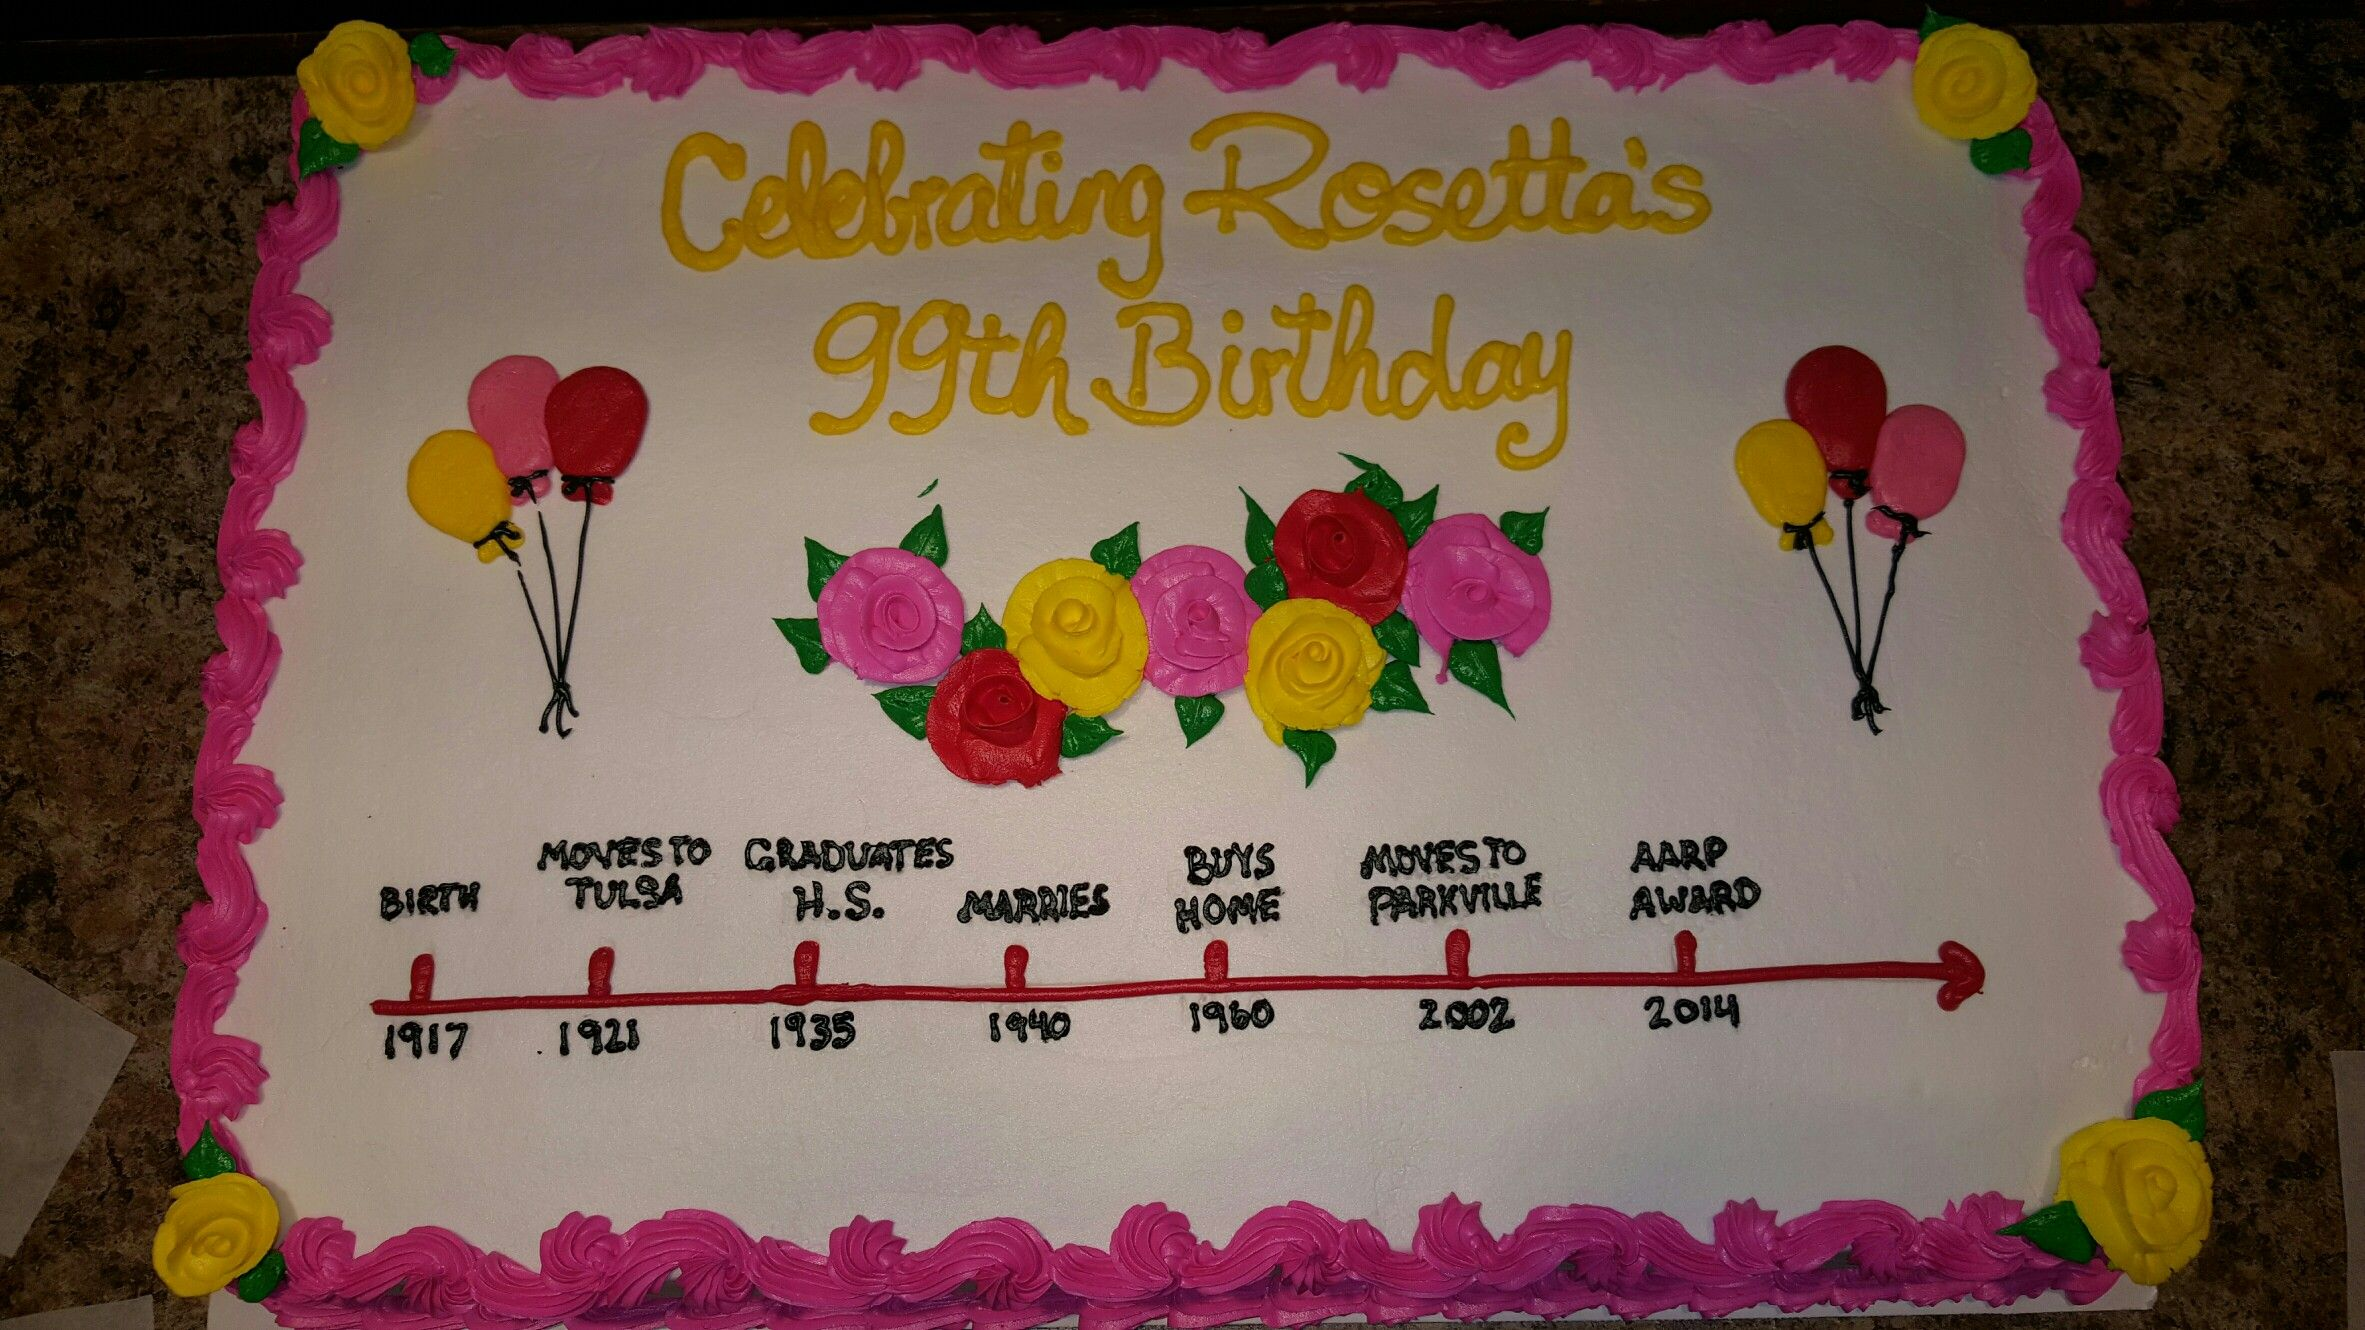 99th Birthday Timeline Cake By Karen S Kaykes 99th Birthday